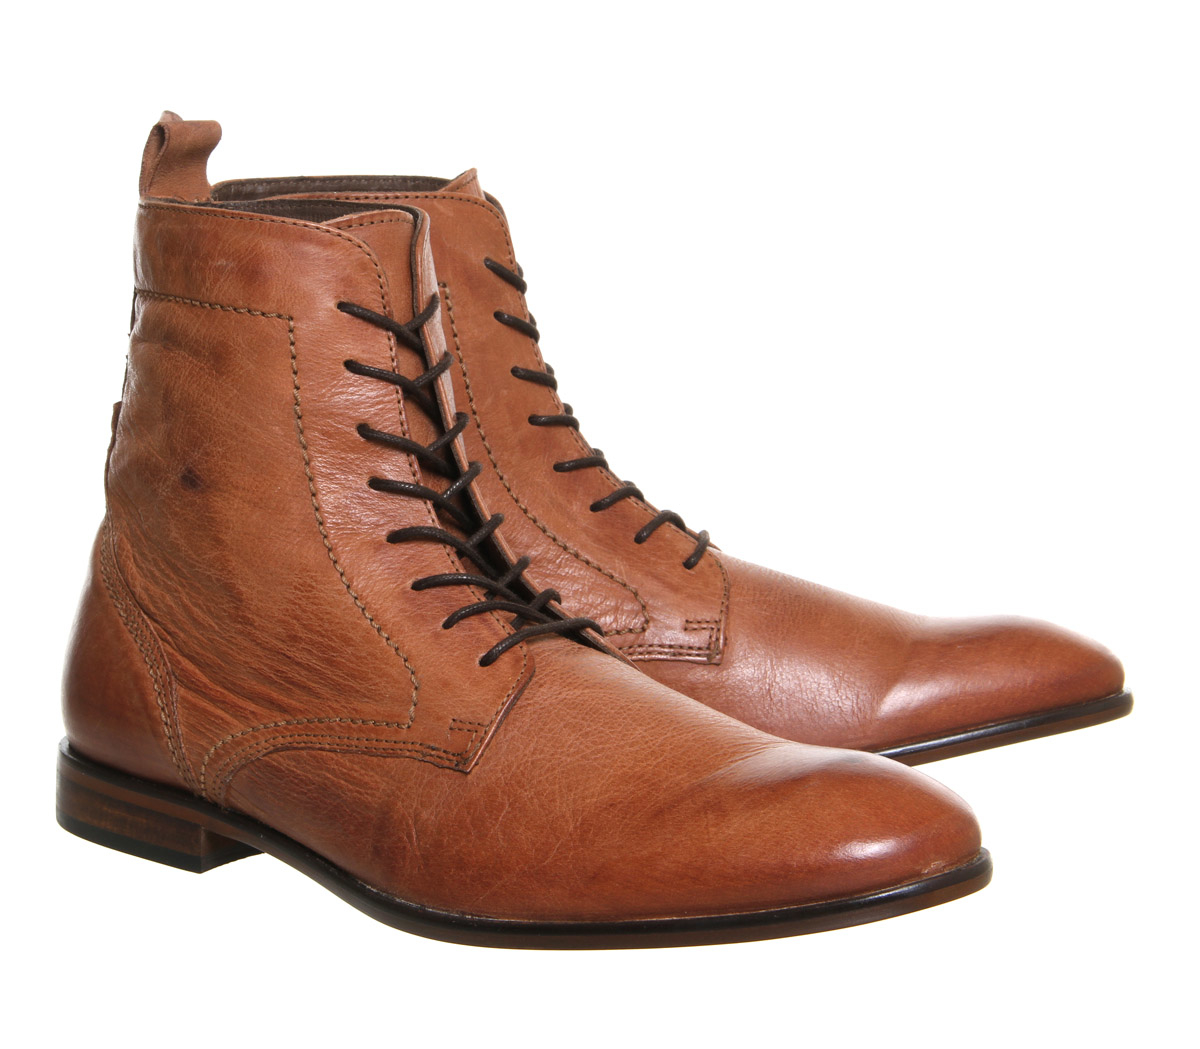 h by hudson martin boot in brown for men tan lyst. Black Bedroom Furniture Sets. Home Design Ideas